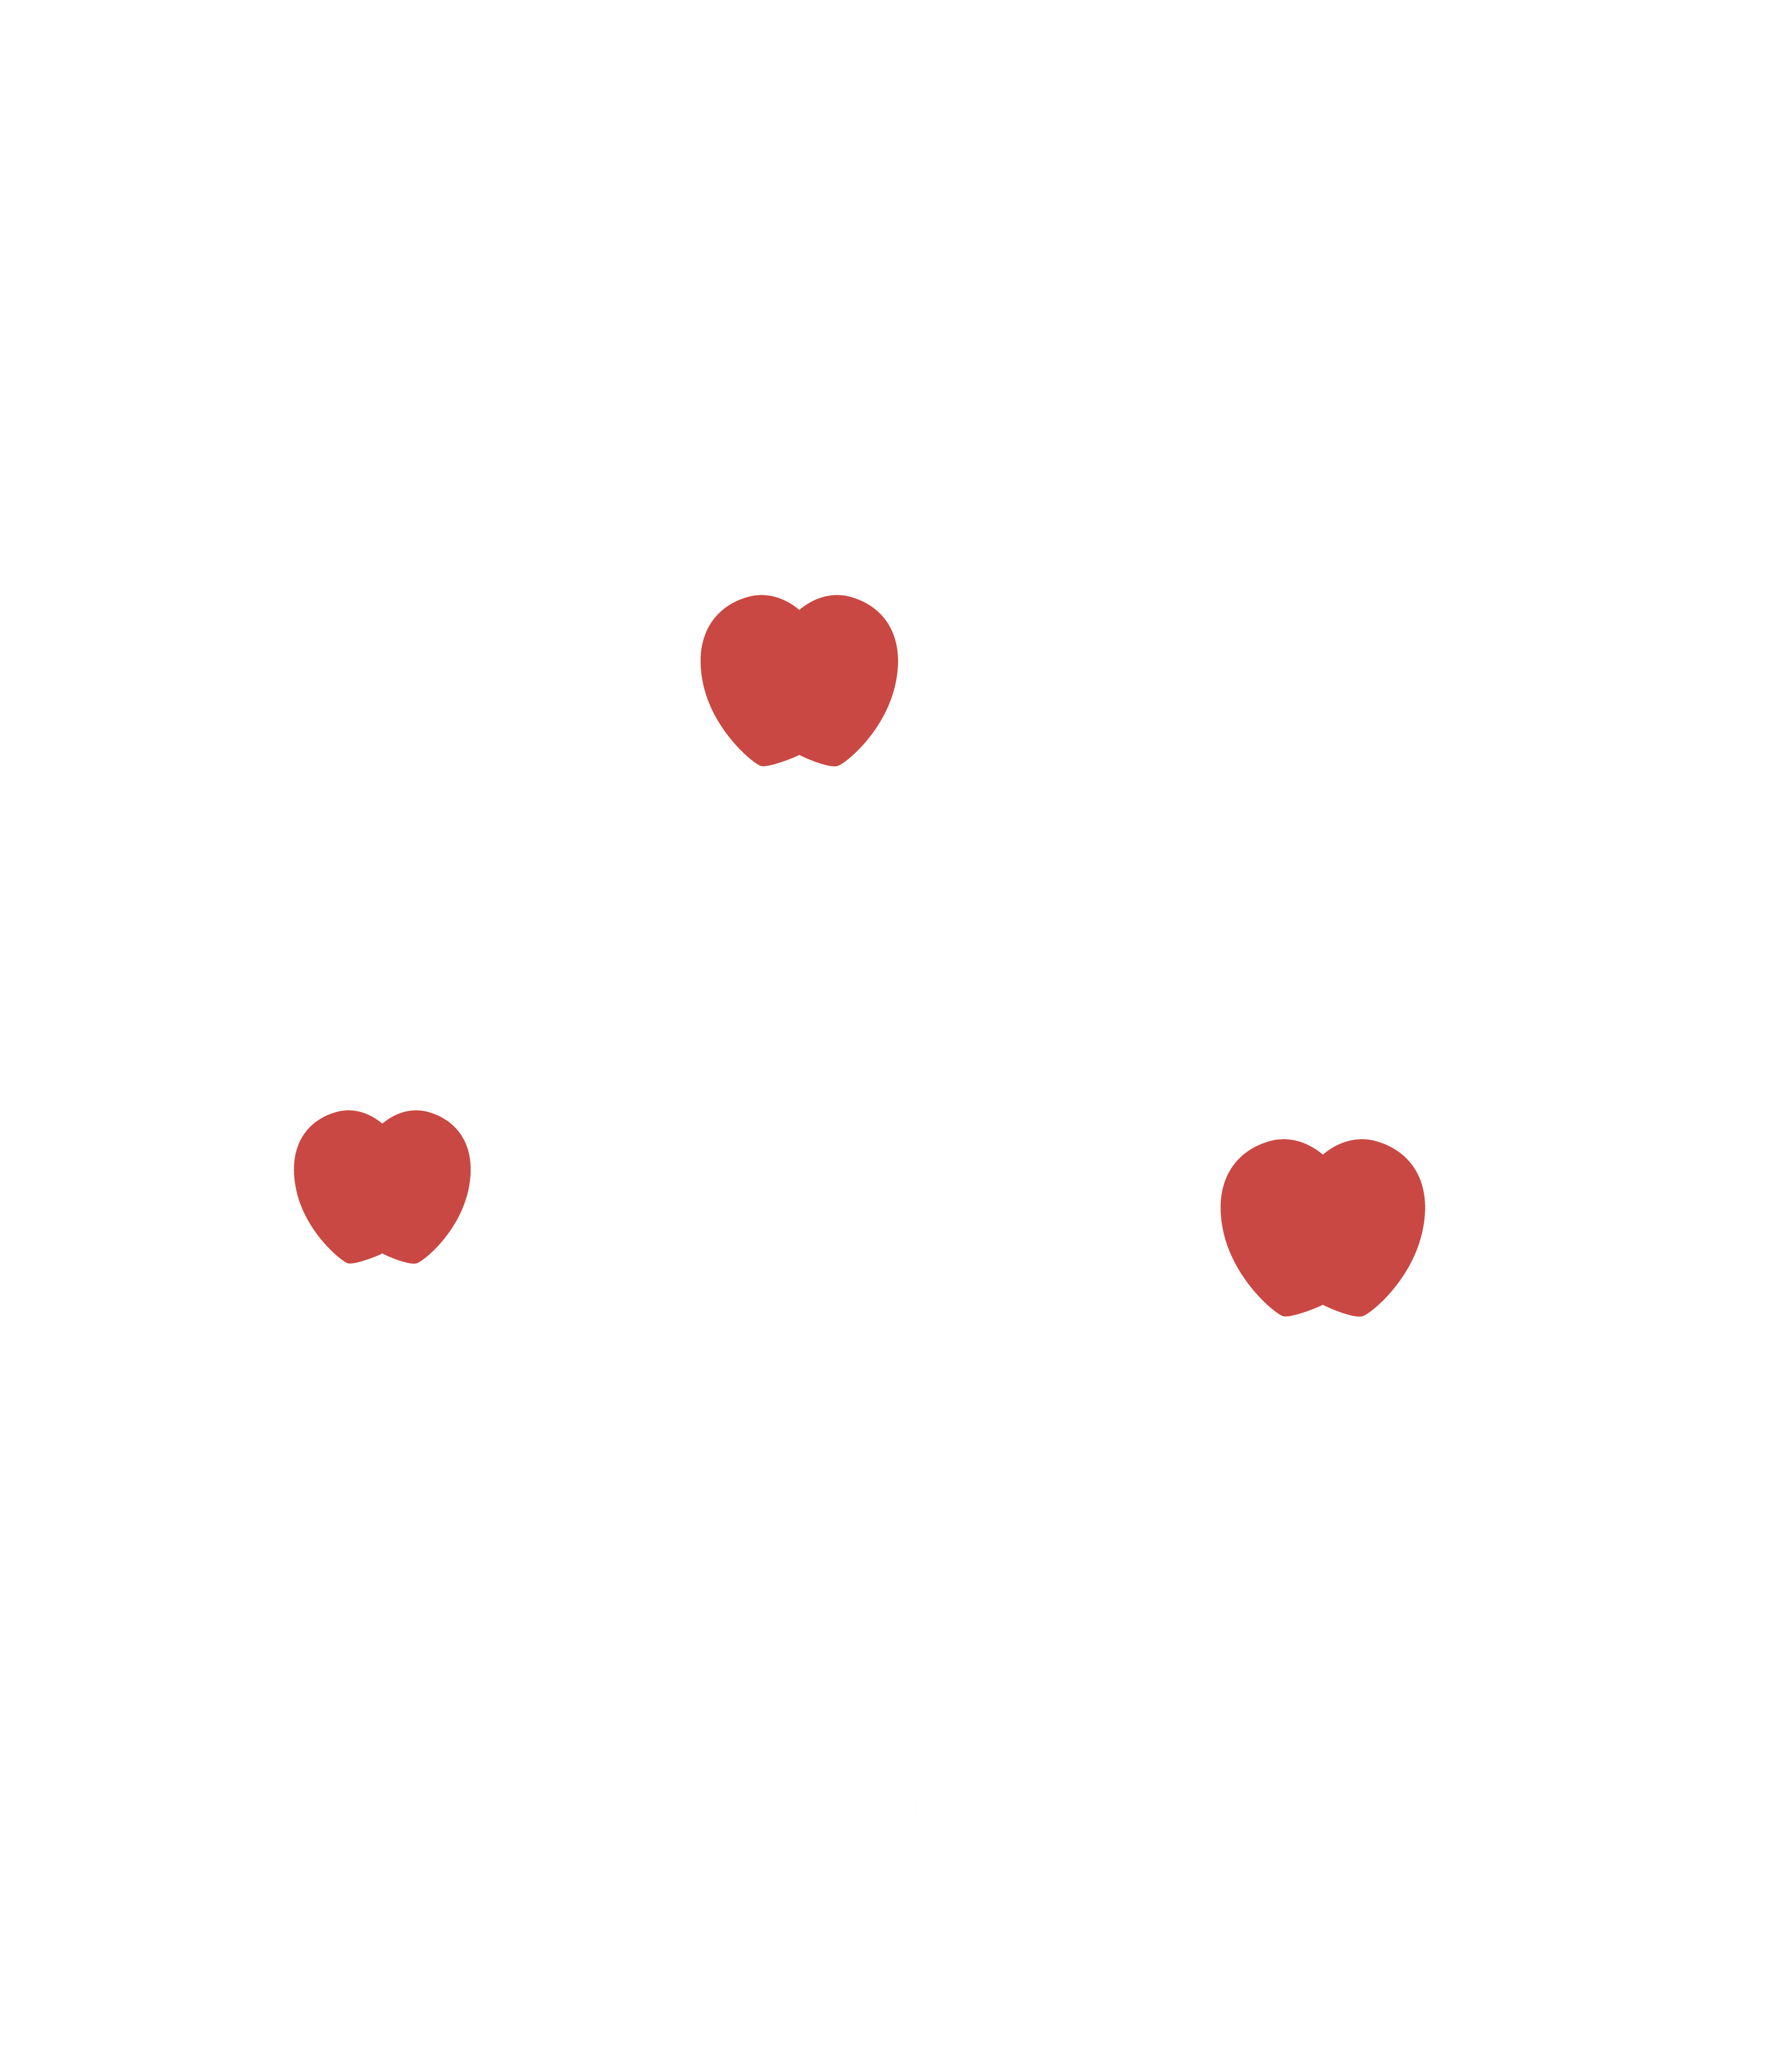 Sady Starý Lískovec